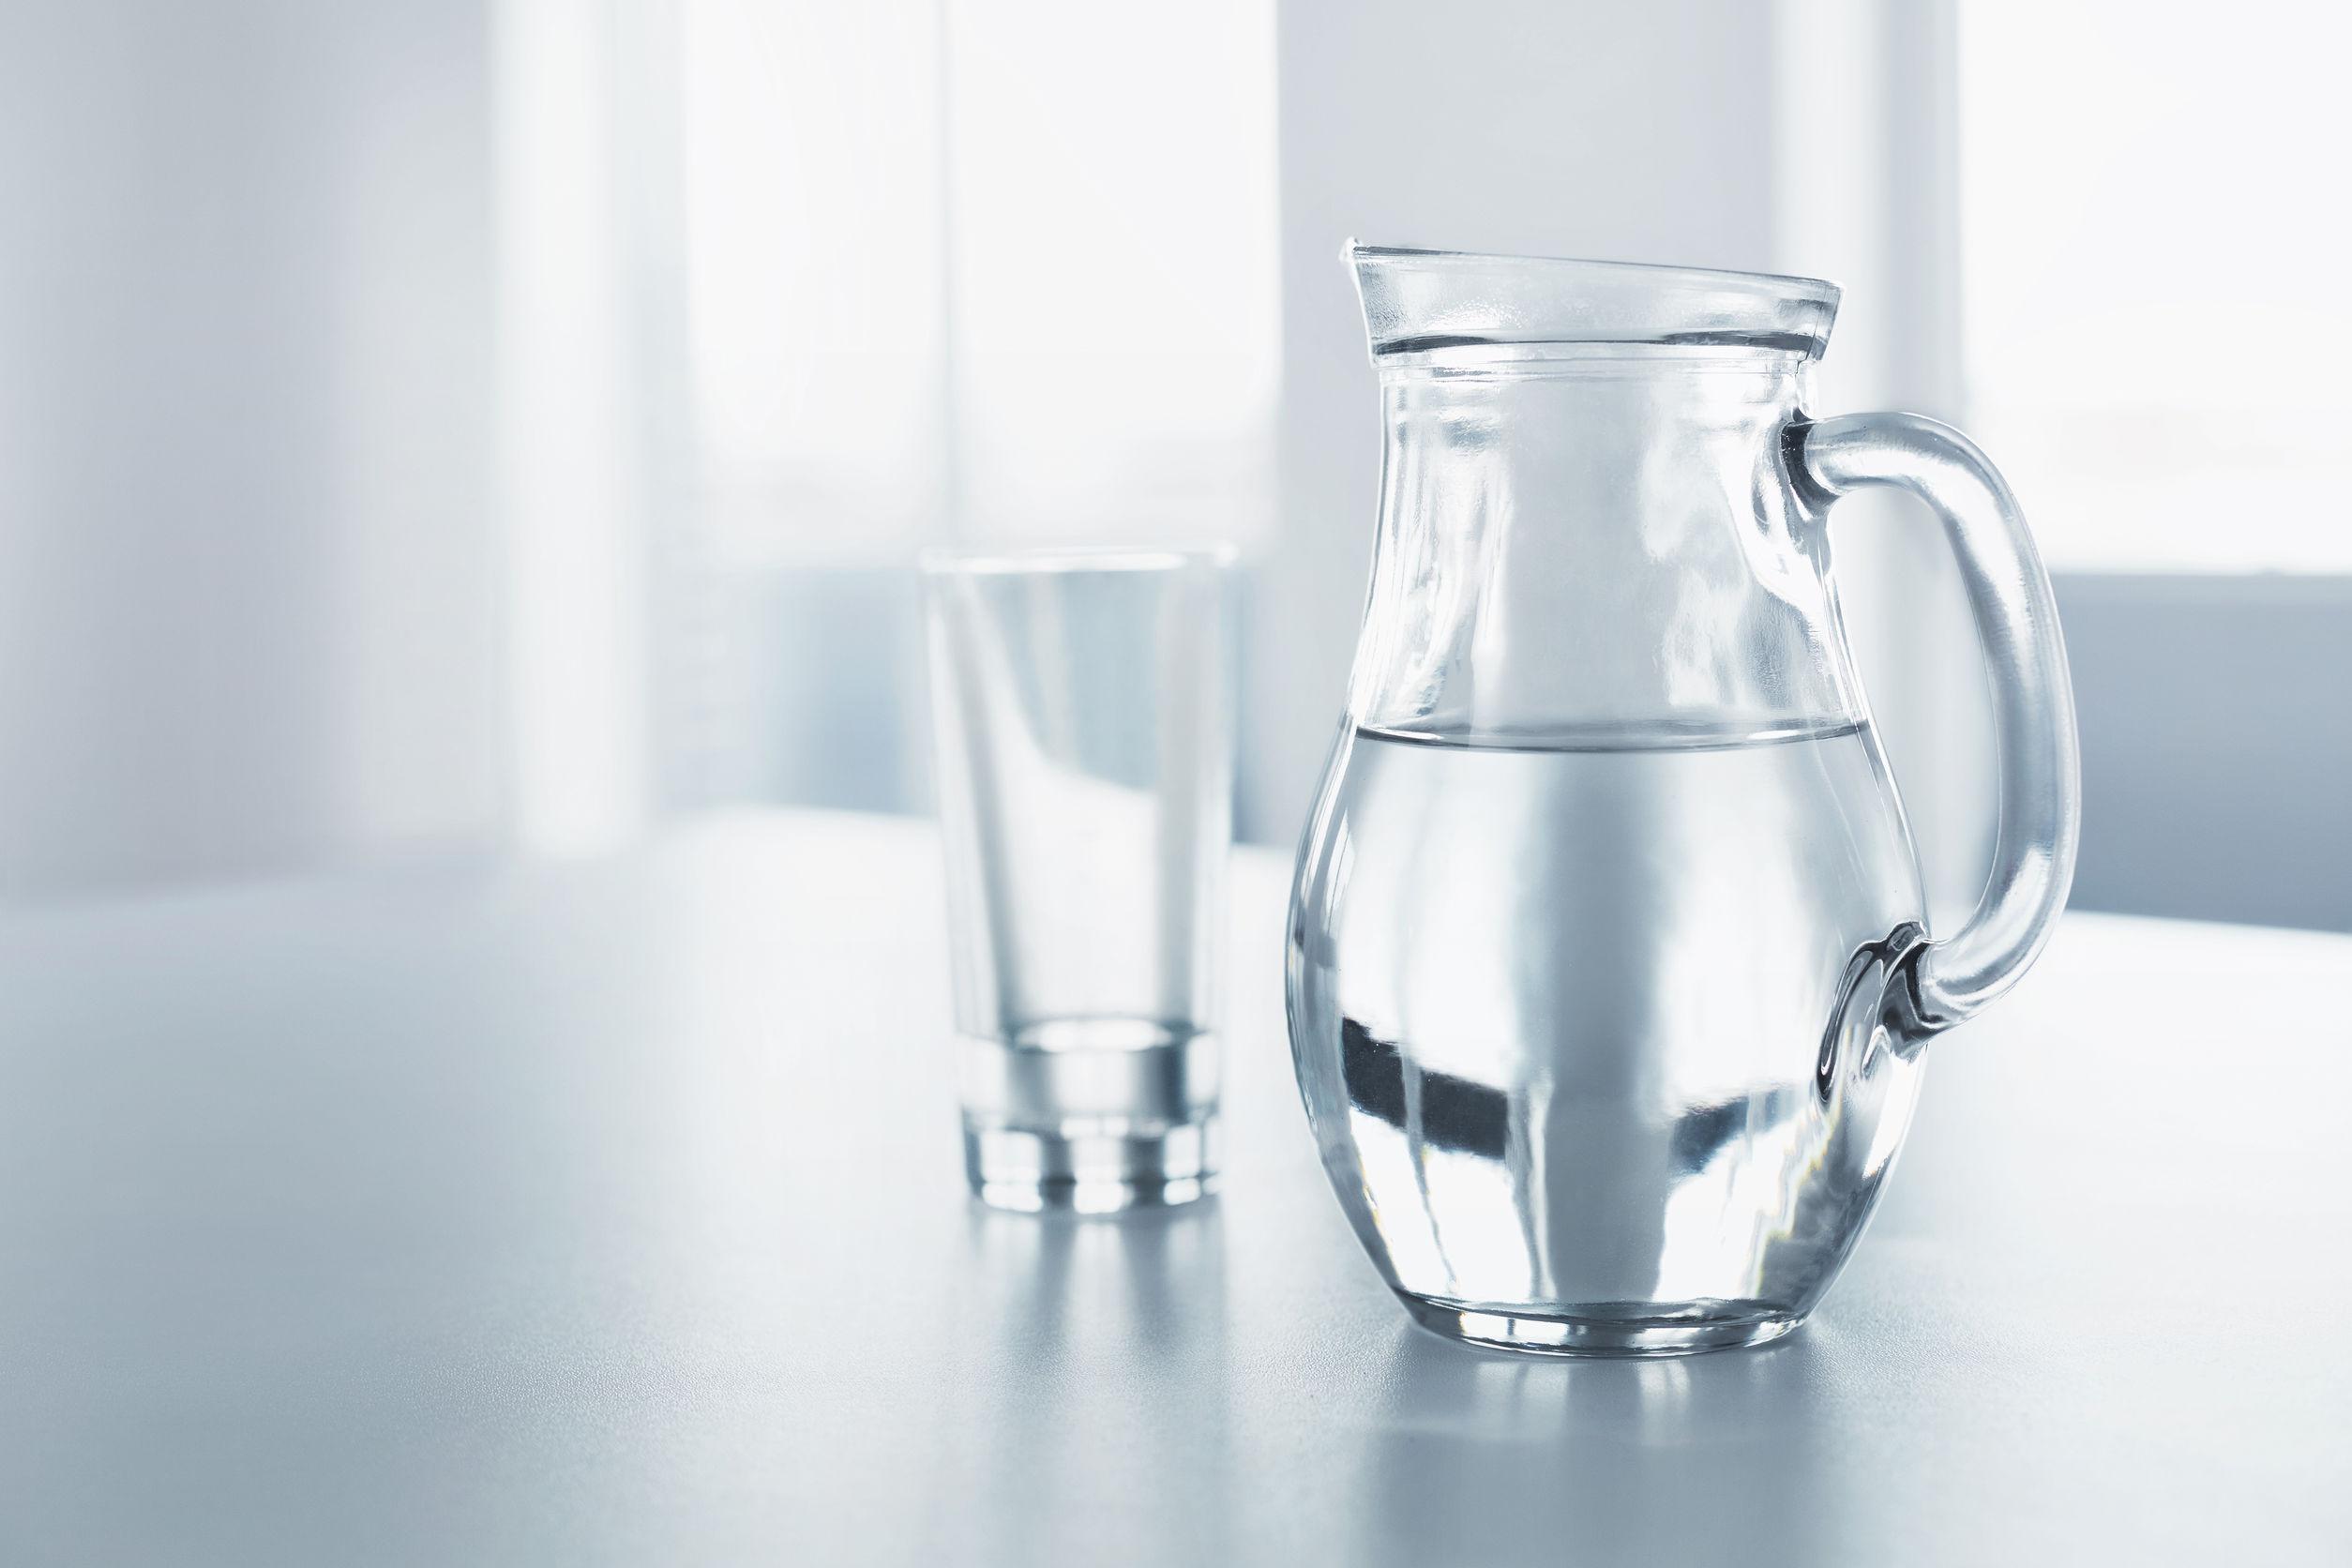 ![Fight off a UTI by drinking lots of water](https://resilienceptchatt.com/storage/app/uploads/public/5d9/346/dc5/5d9346dc573fd457982604.jpg)